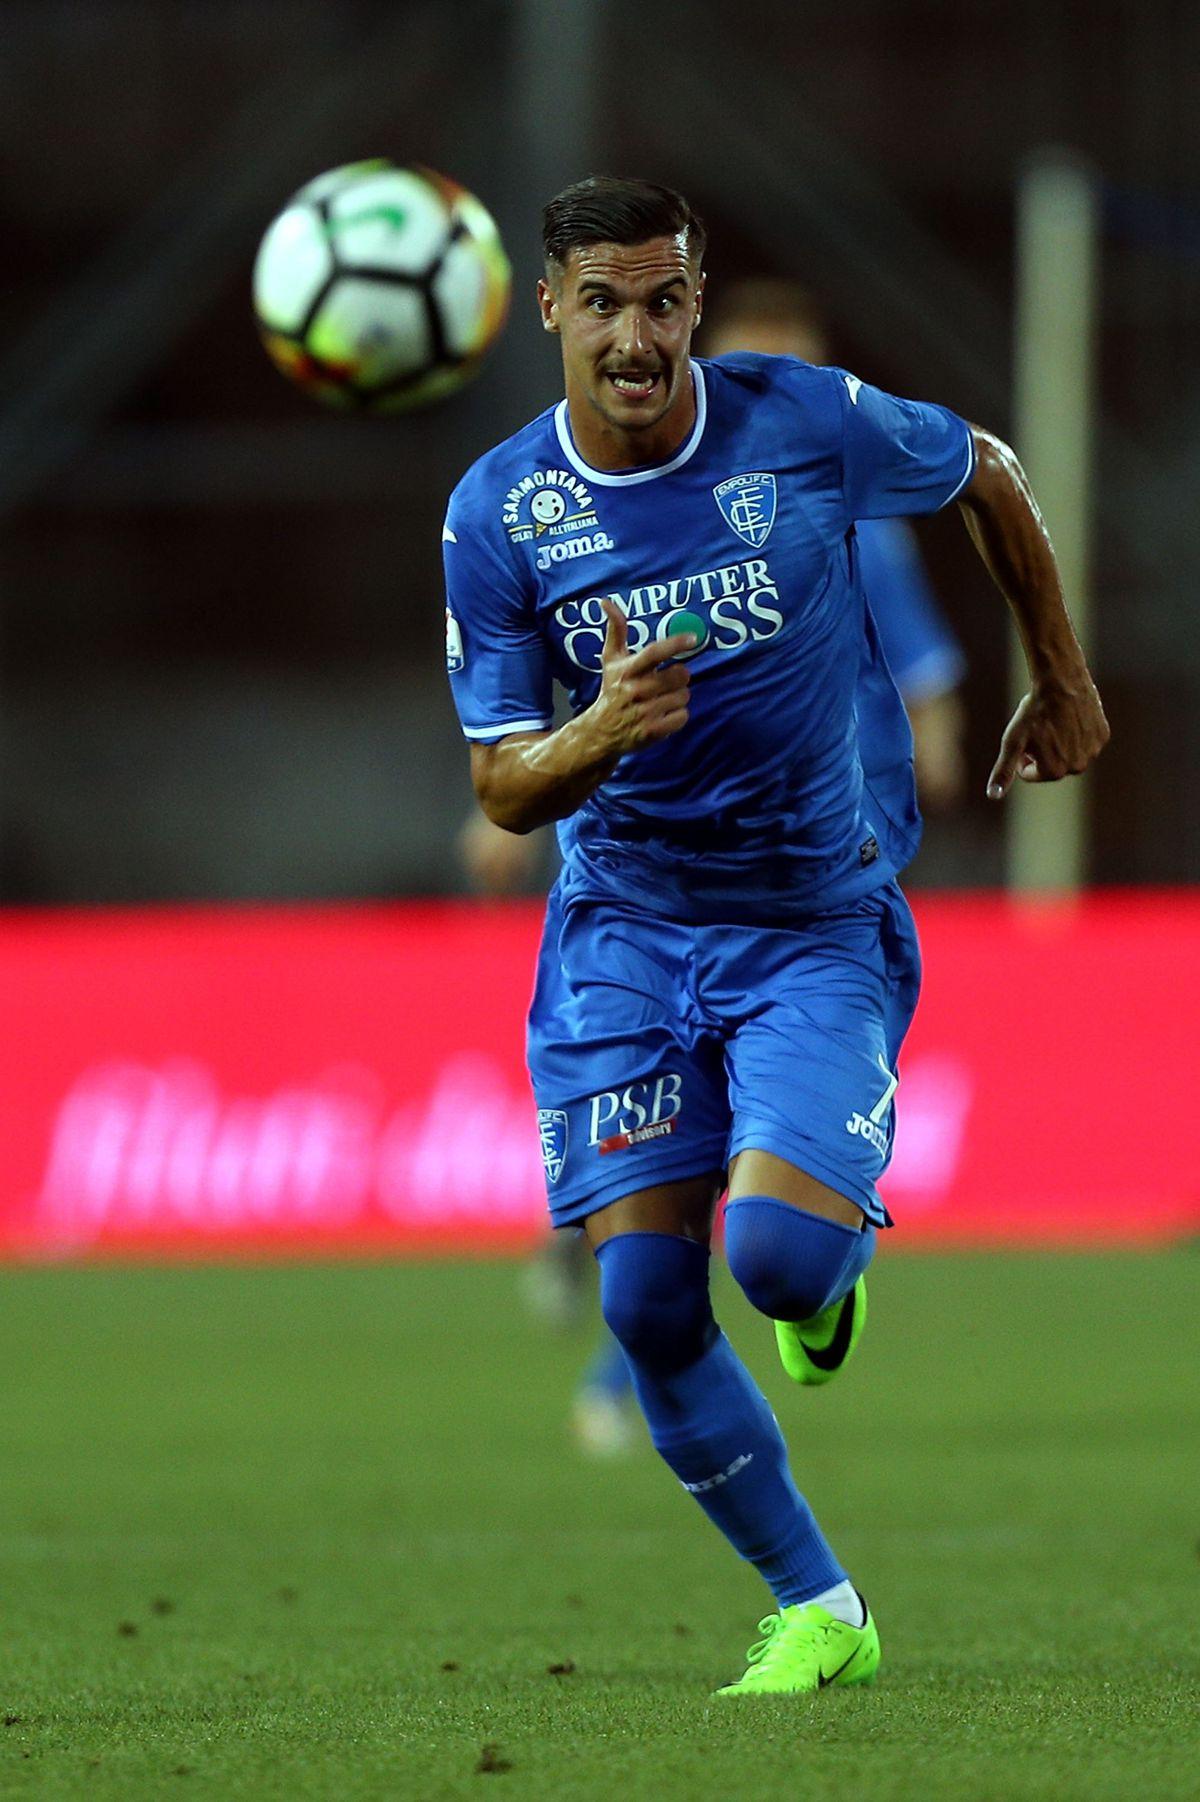 Empoli FC v Renate - TIM Cup